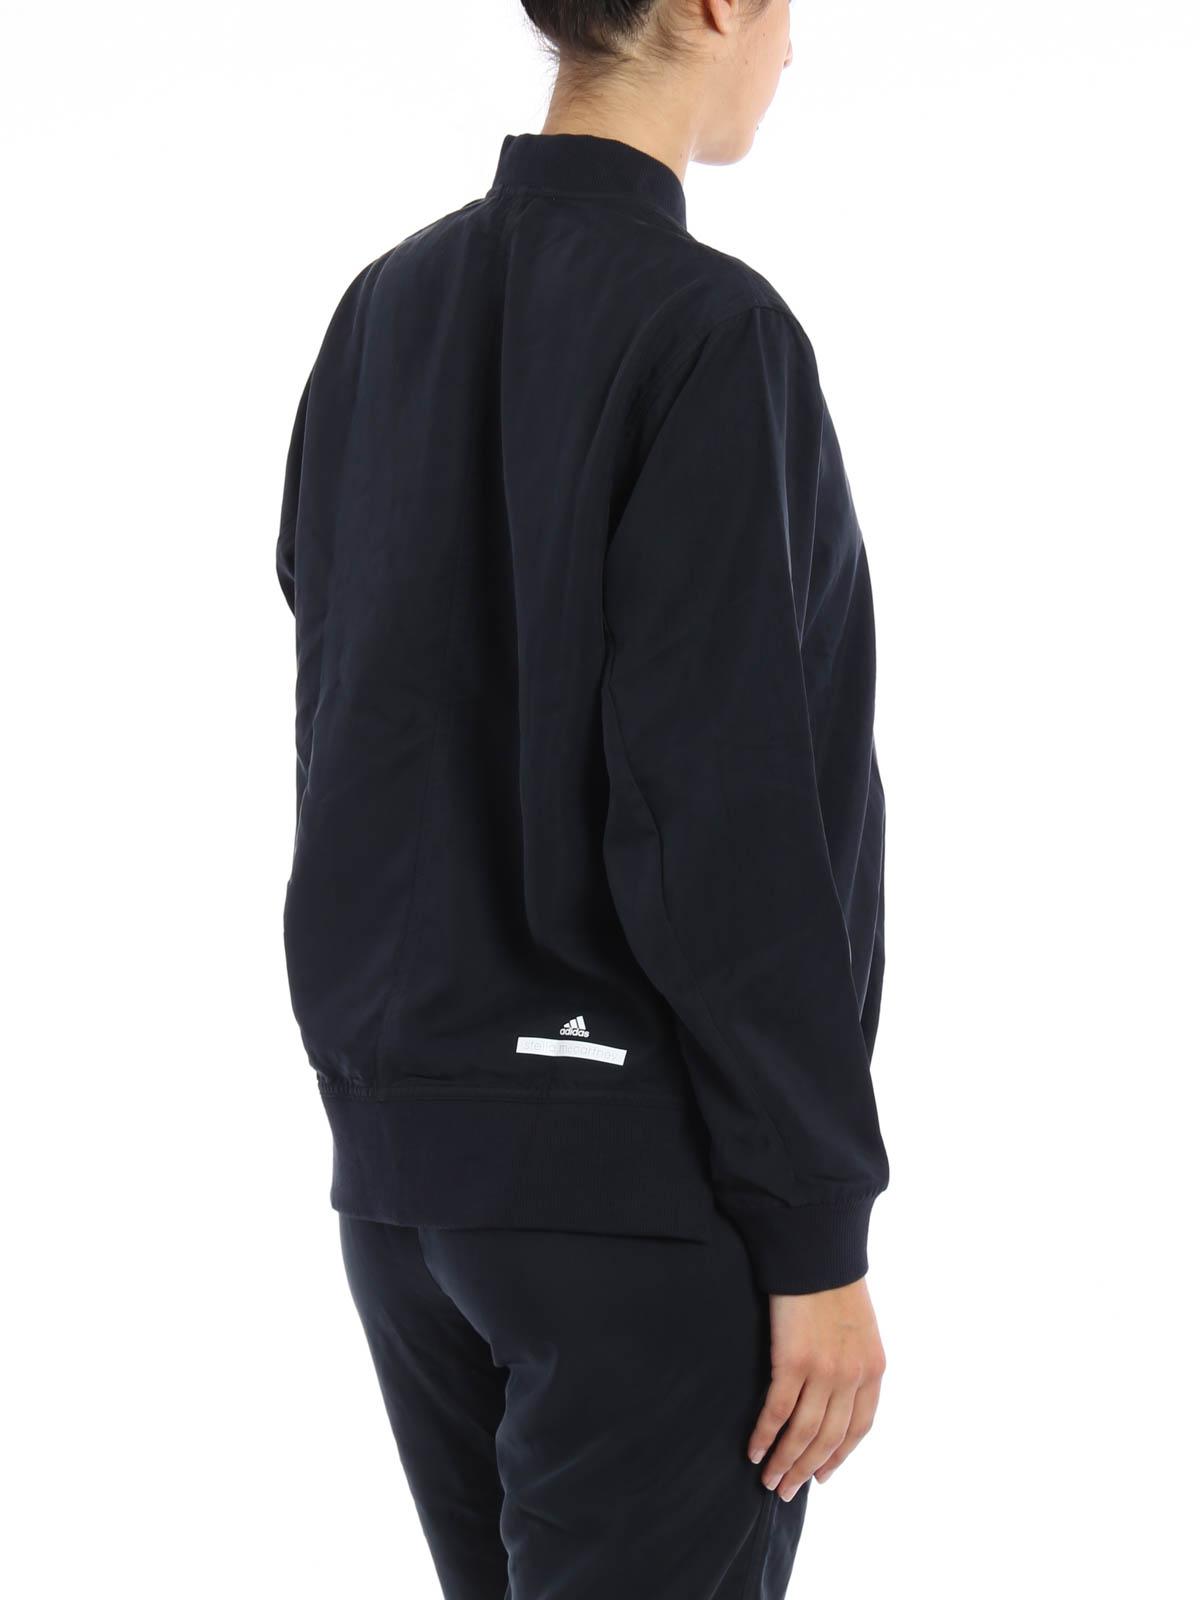 Bomber Stella By Adidas Mujer Mccartney Para Negra Chaqueta qw8qOd5I